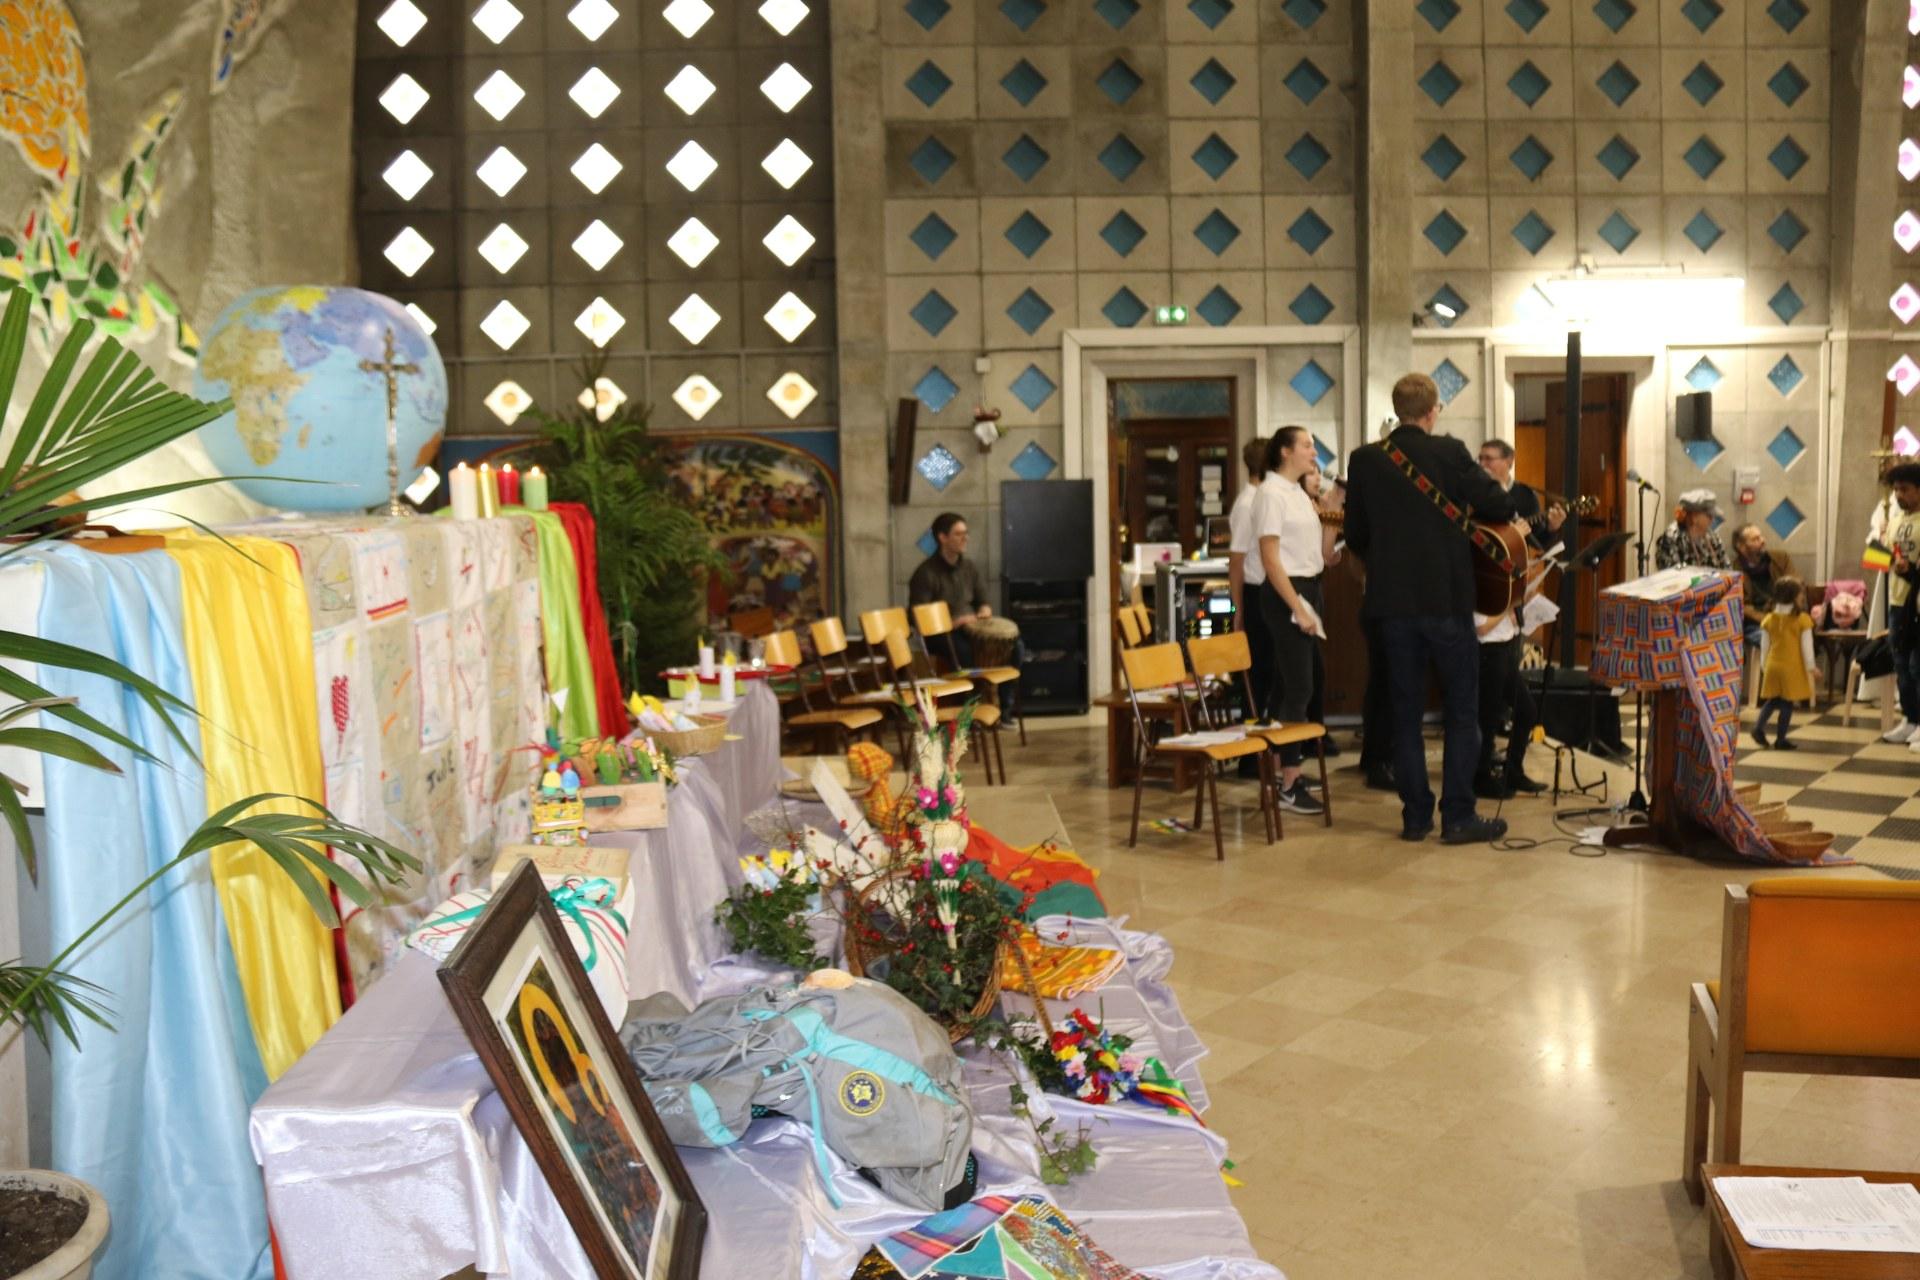 Messe des Nations 106